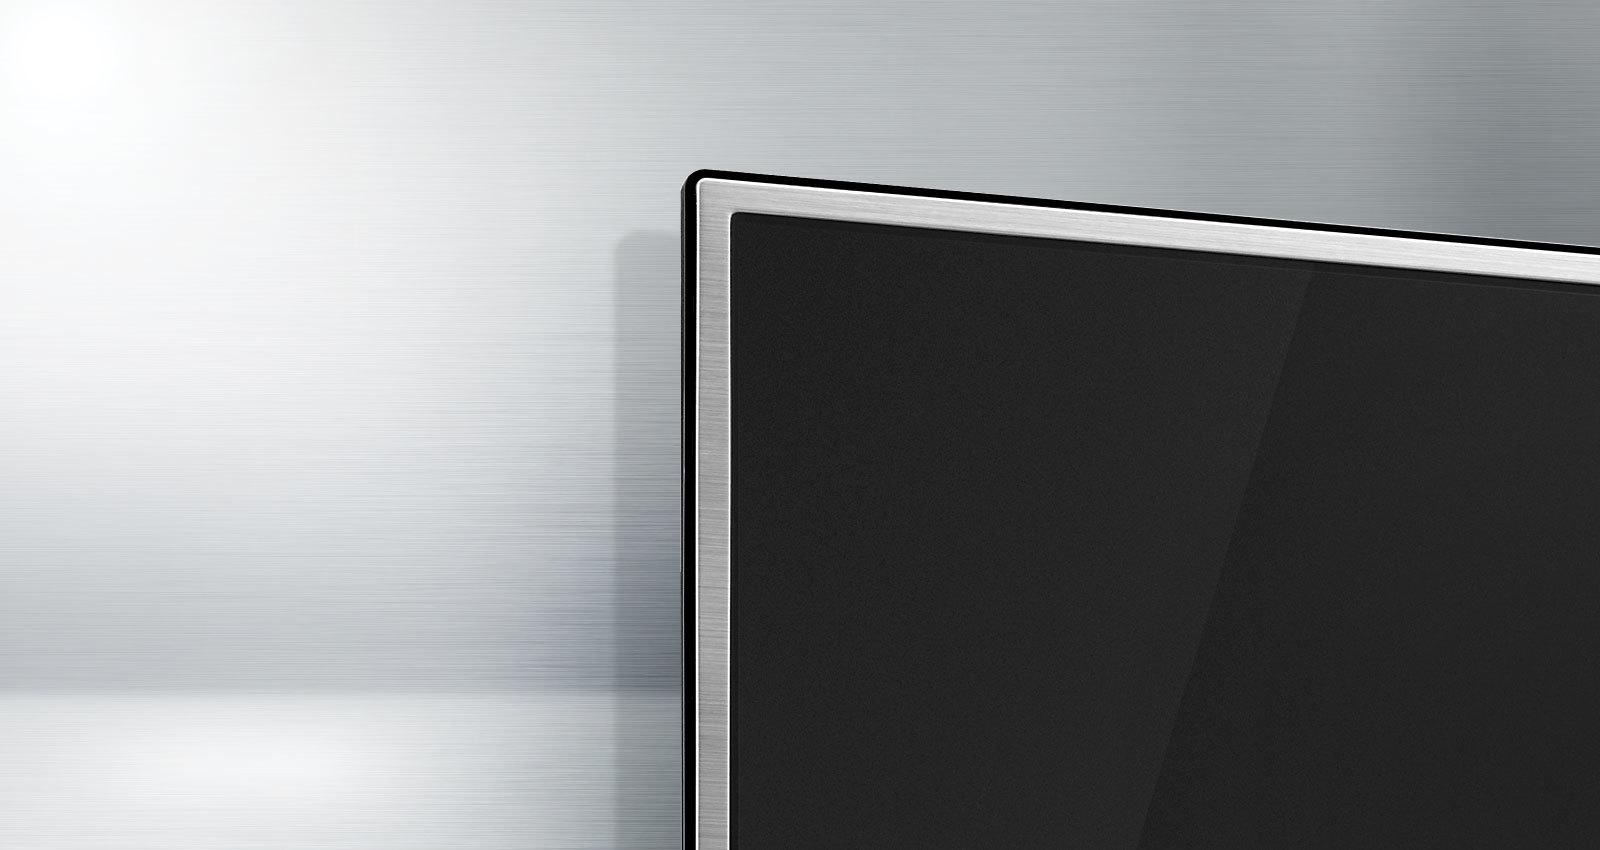 lg tv led 55 39 39 139 cm 55uh605v pas cher achat vente tv led de 50 39 39 55 39 39 uhd 4k rueducommerce. Black Bedroom Furniture Sets. Home Design Ideas